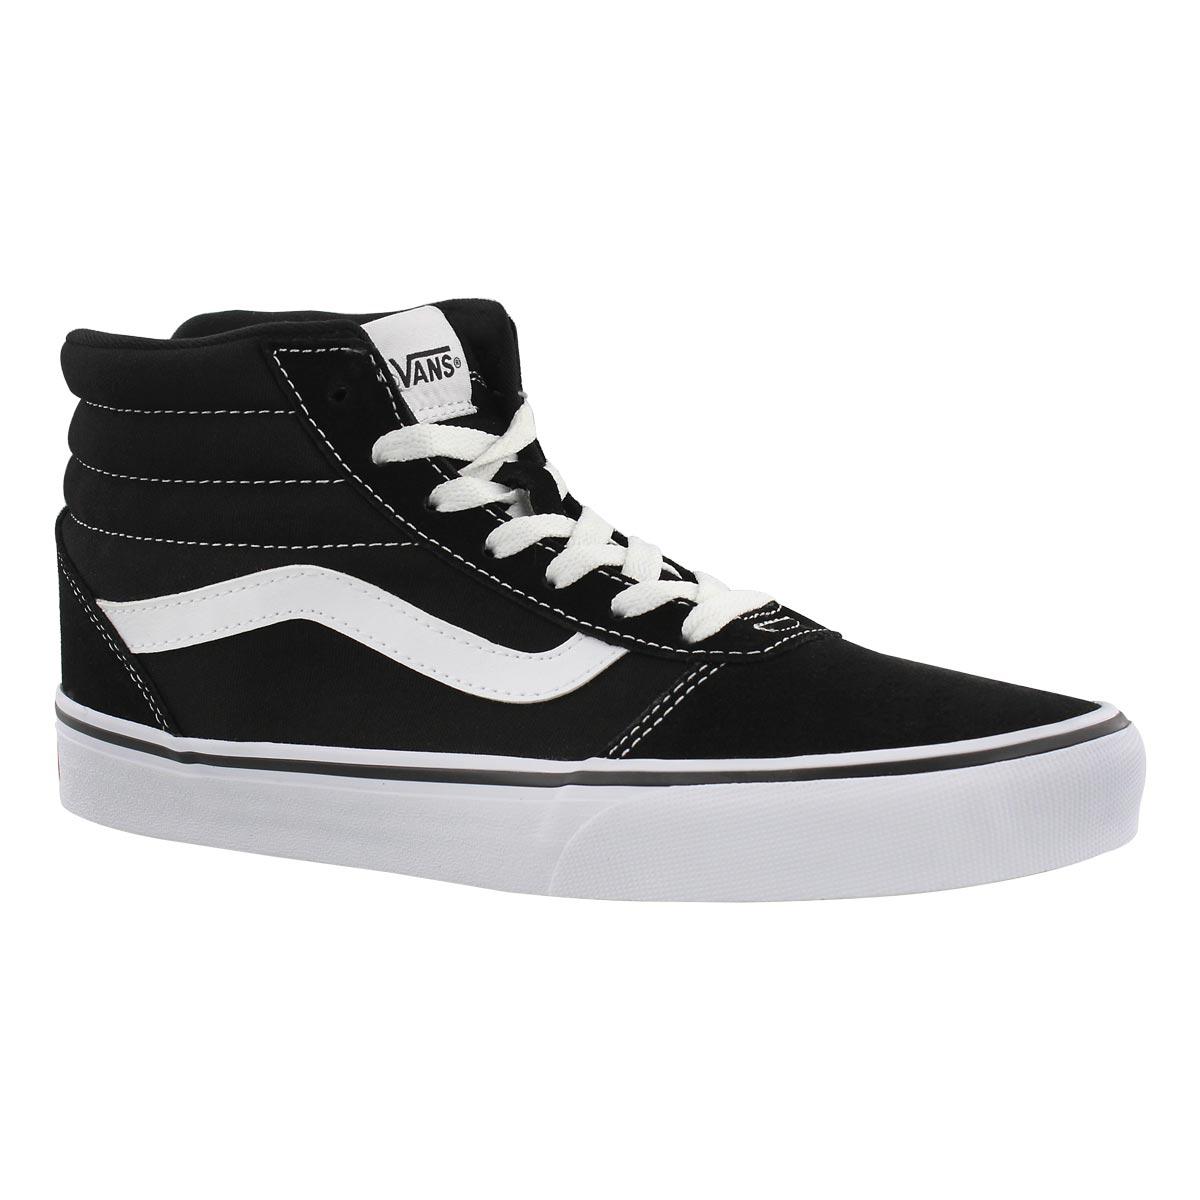 Women's WARD HI blk/wht laceup sneakers